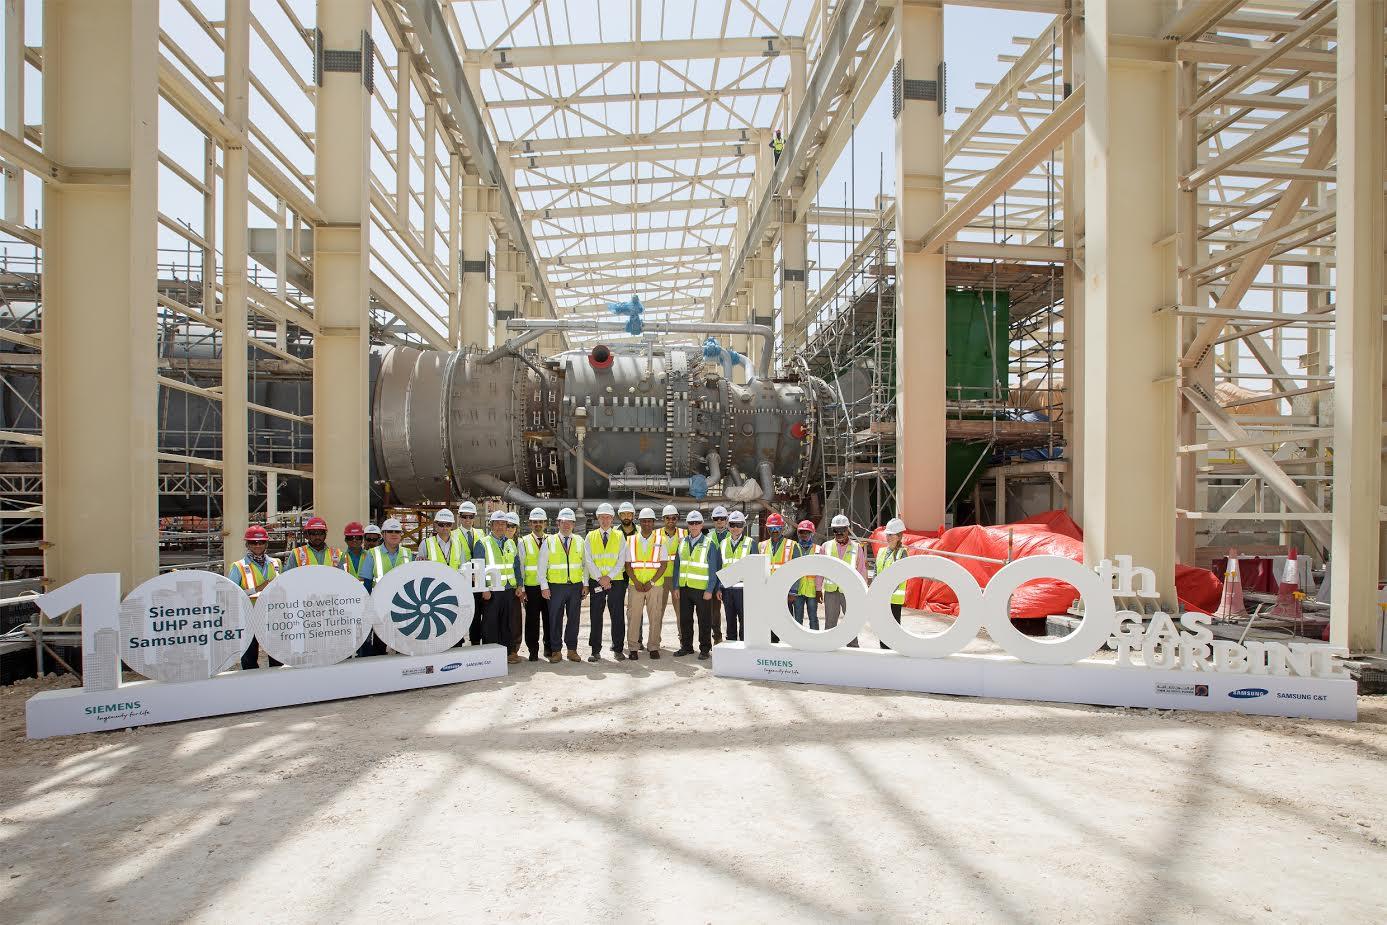 Siemens 1,000th gas turbine arrives at Umm Al Houl power